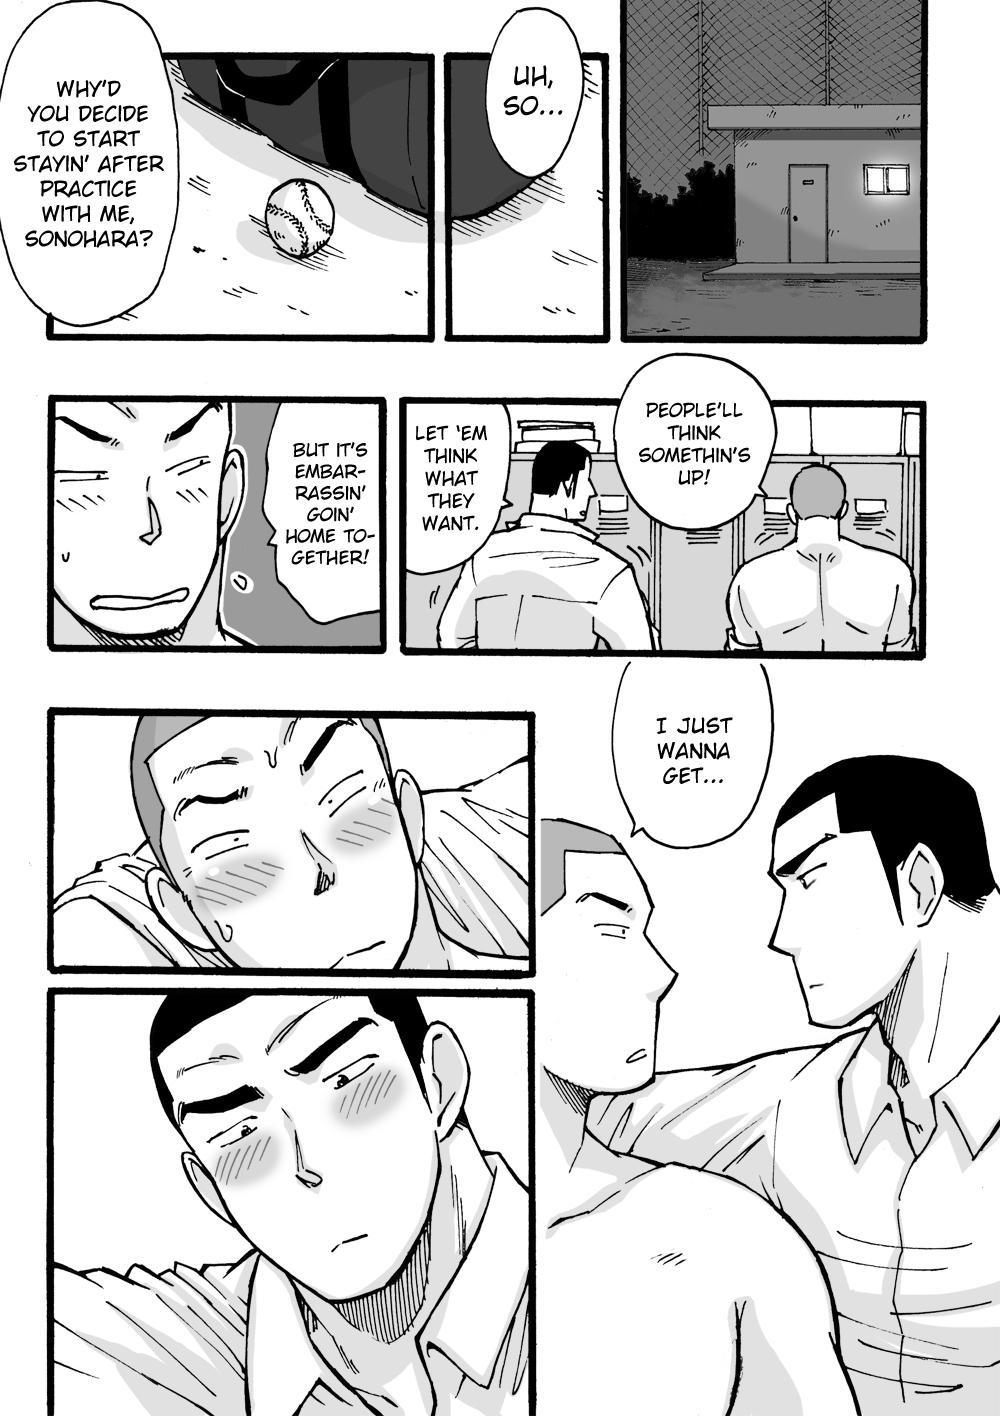 [Akahachi] Motemote Yakyuubu Otoko [Kouhen] | Popular Baseball Club Boys (Part Two) [English] [Papatez] 51